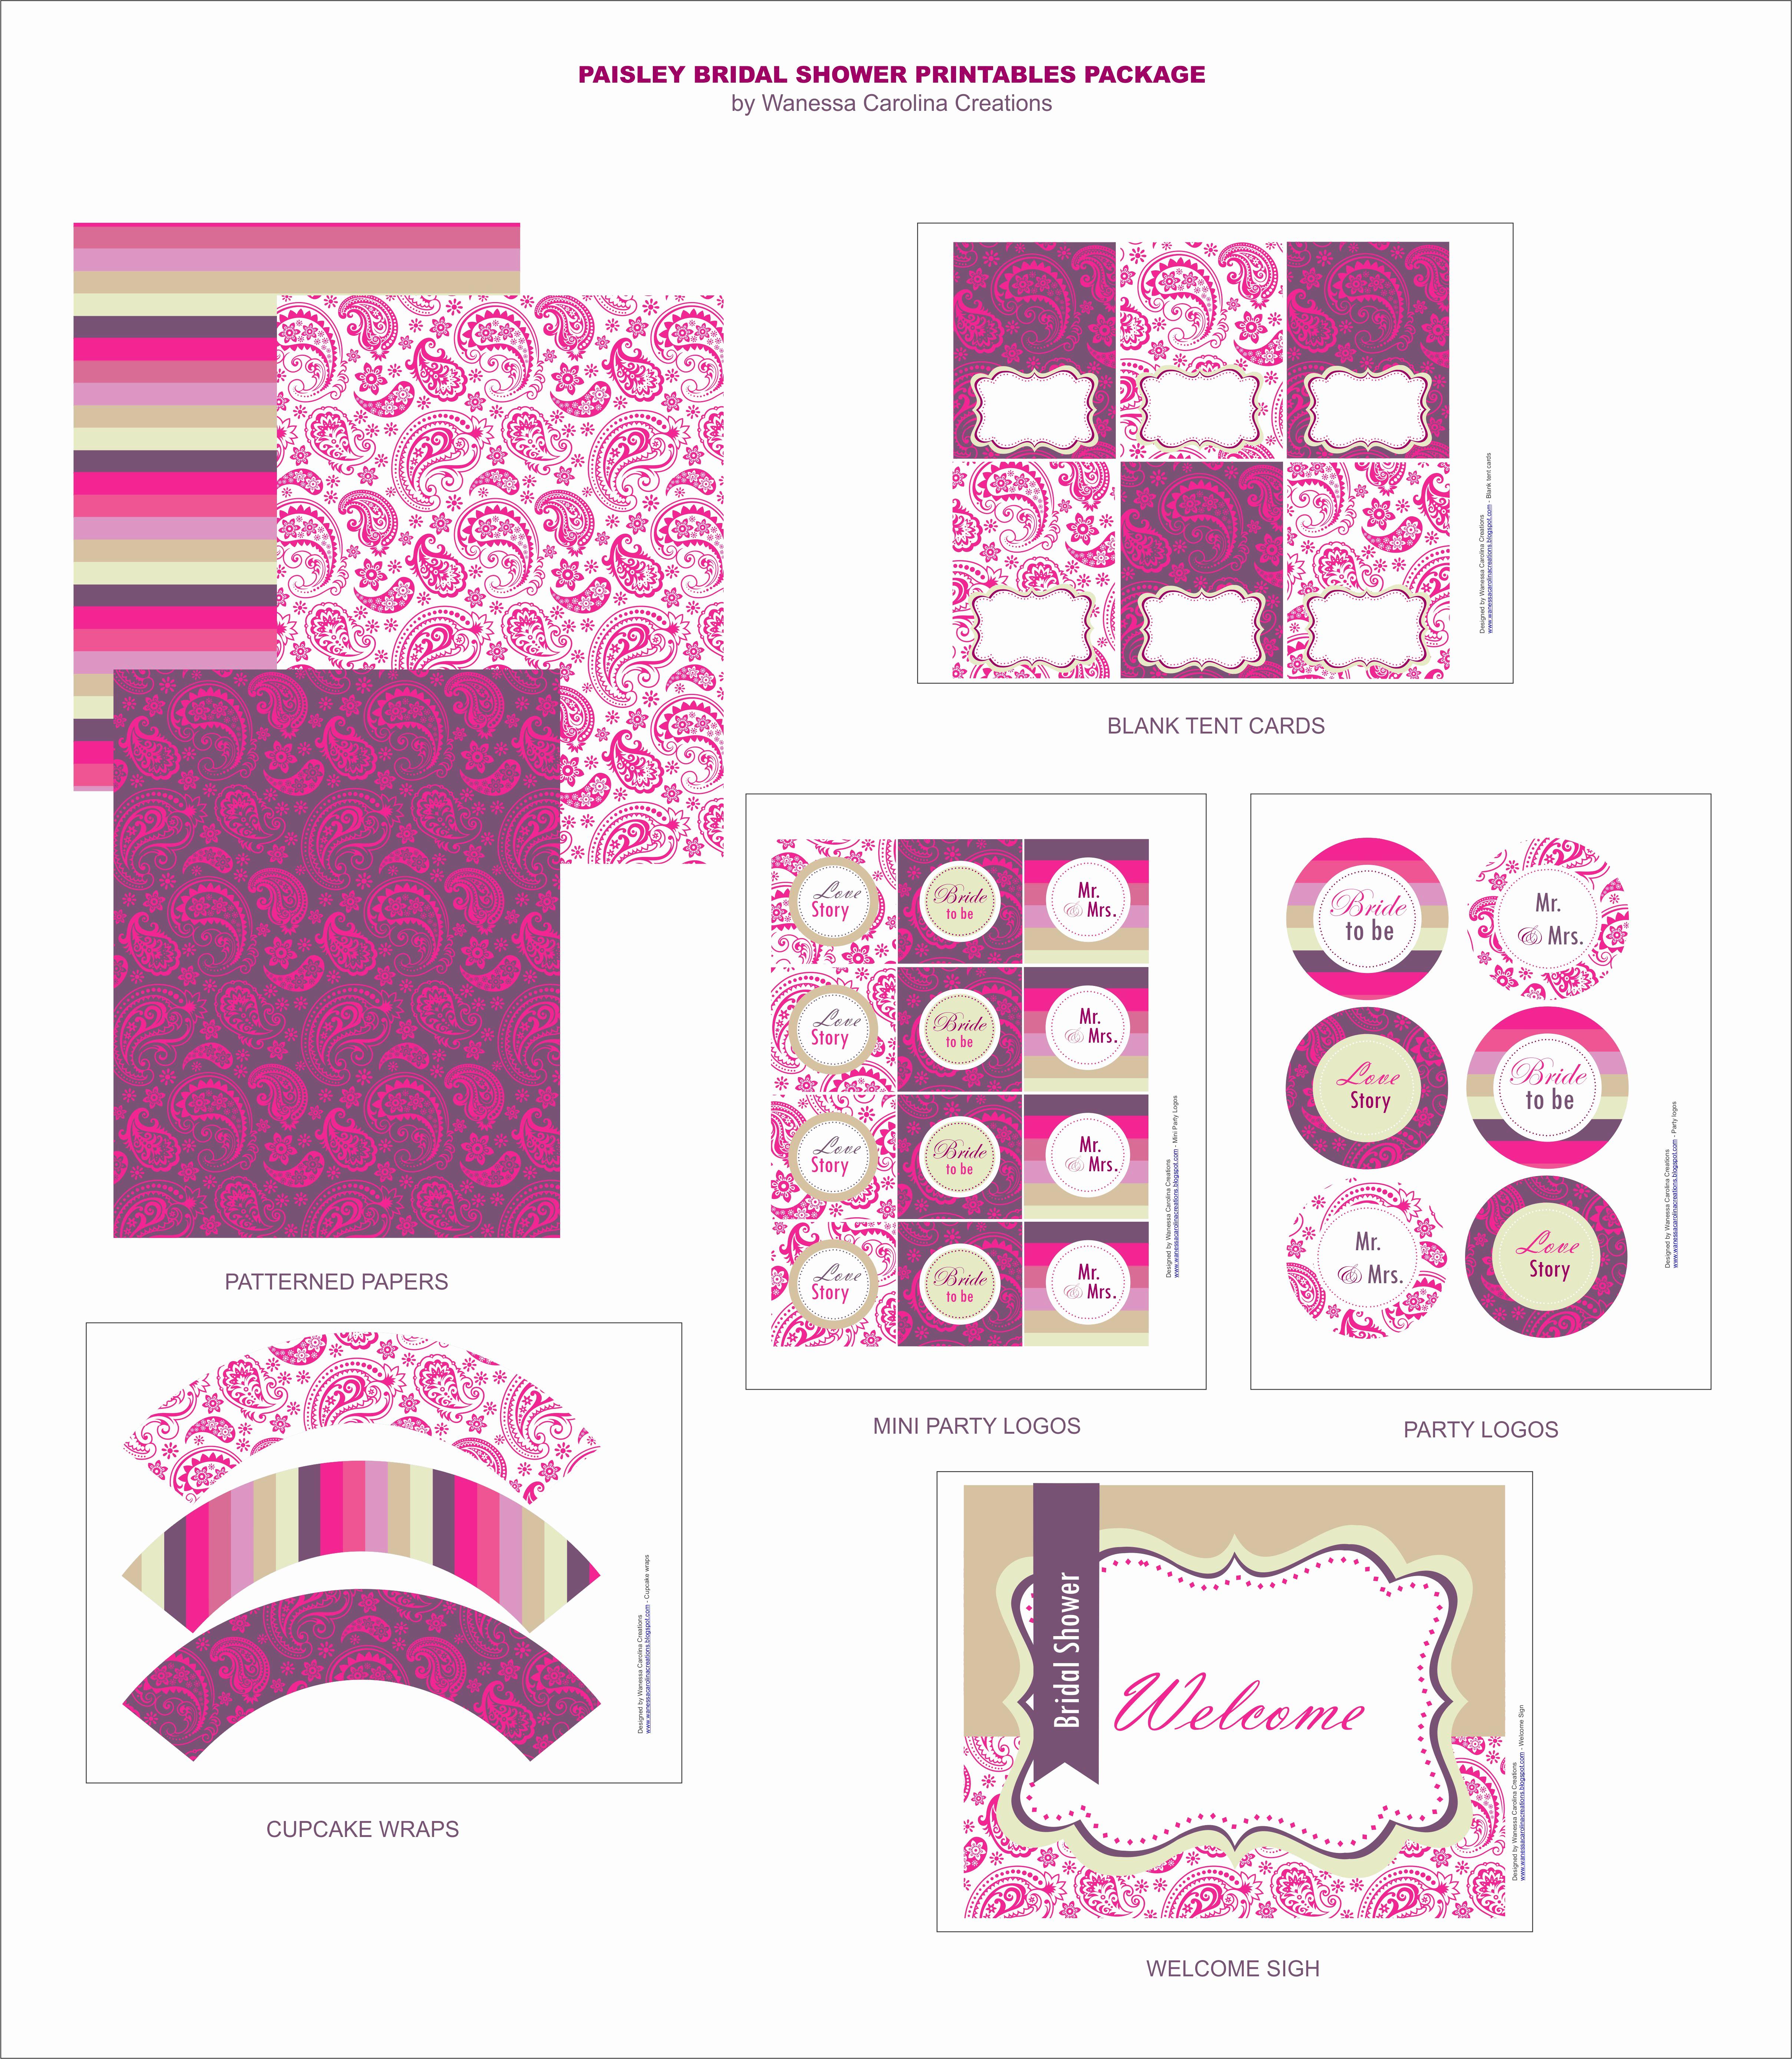 Printable Bridal Shower Invitations Elegant Free Bridal Shower Printables From Wanessa Carolina